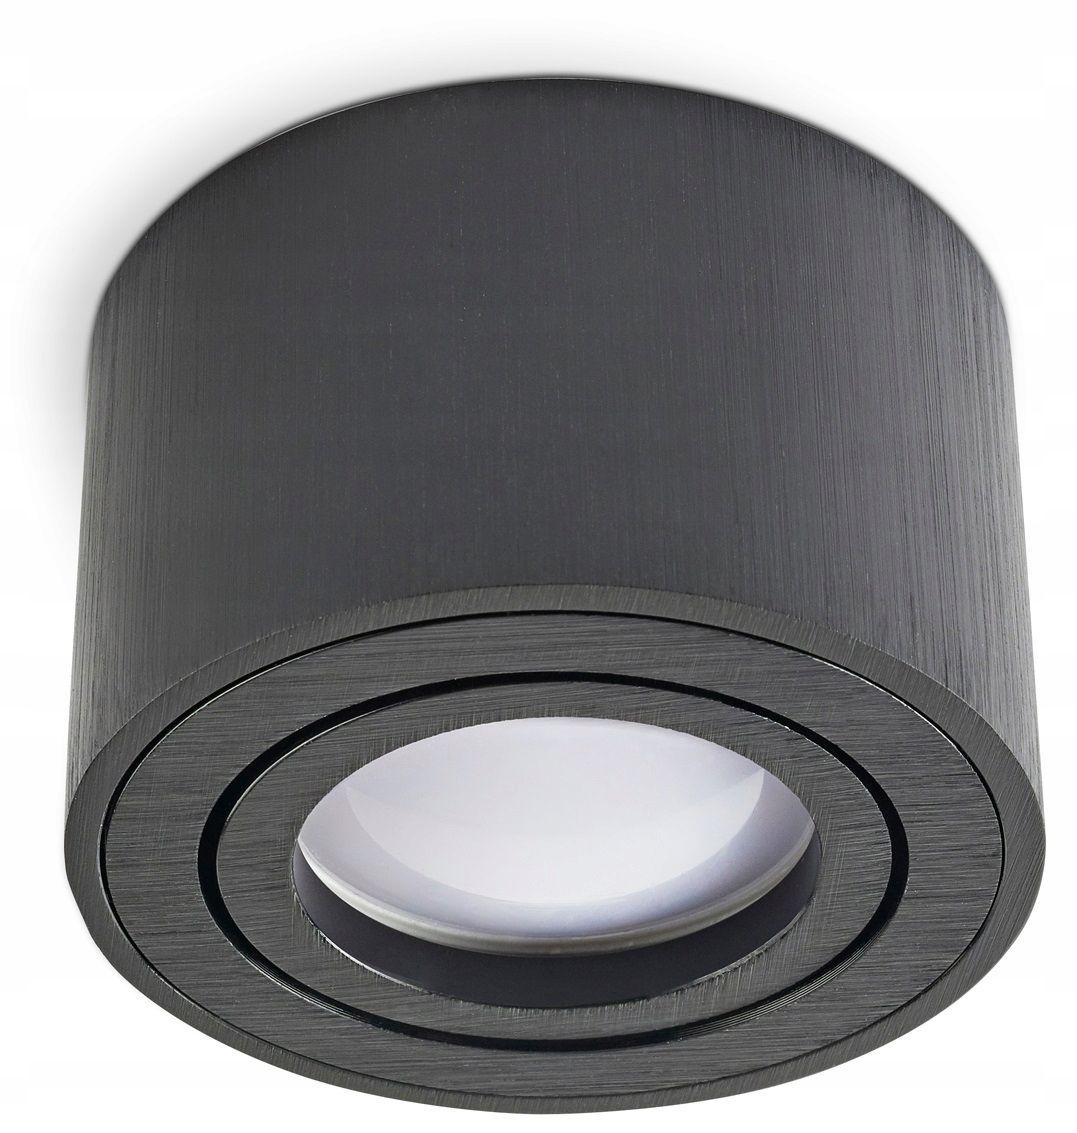 Kup Teraz Na Allegro Pl Za 38 50 Zl Oprawa Halogen Aluminium Natynk Czarna Led 8461740135 Allegro Pl Radosc Zakupow I Bezpieczens In 2020 Led Lamp Halogen